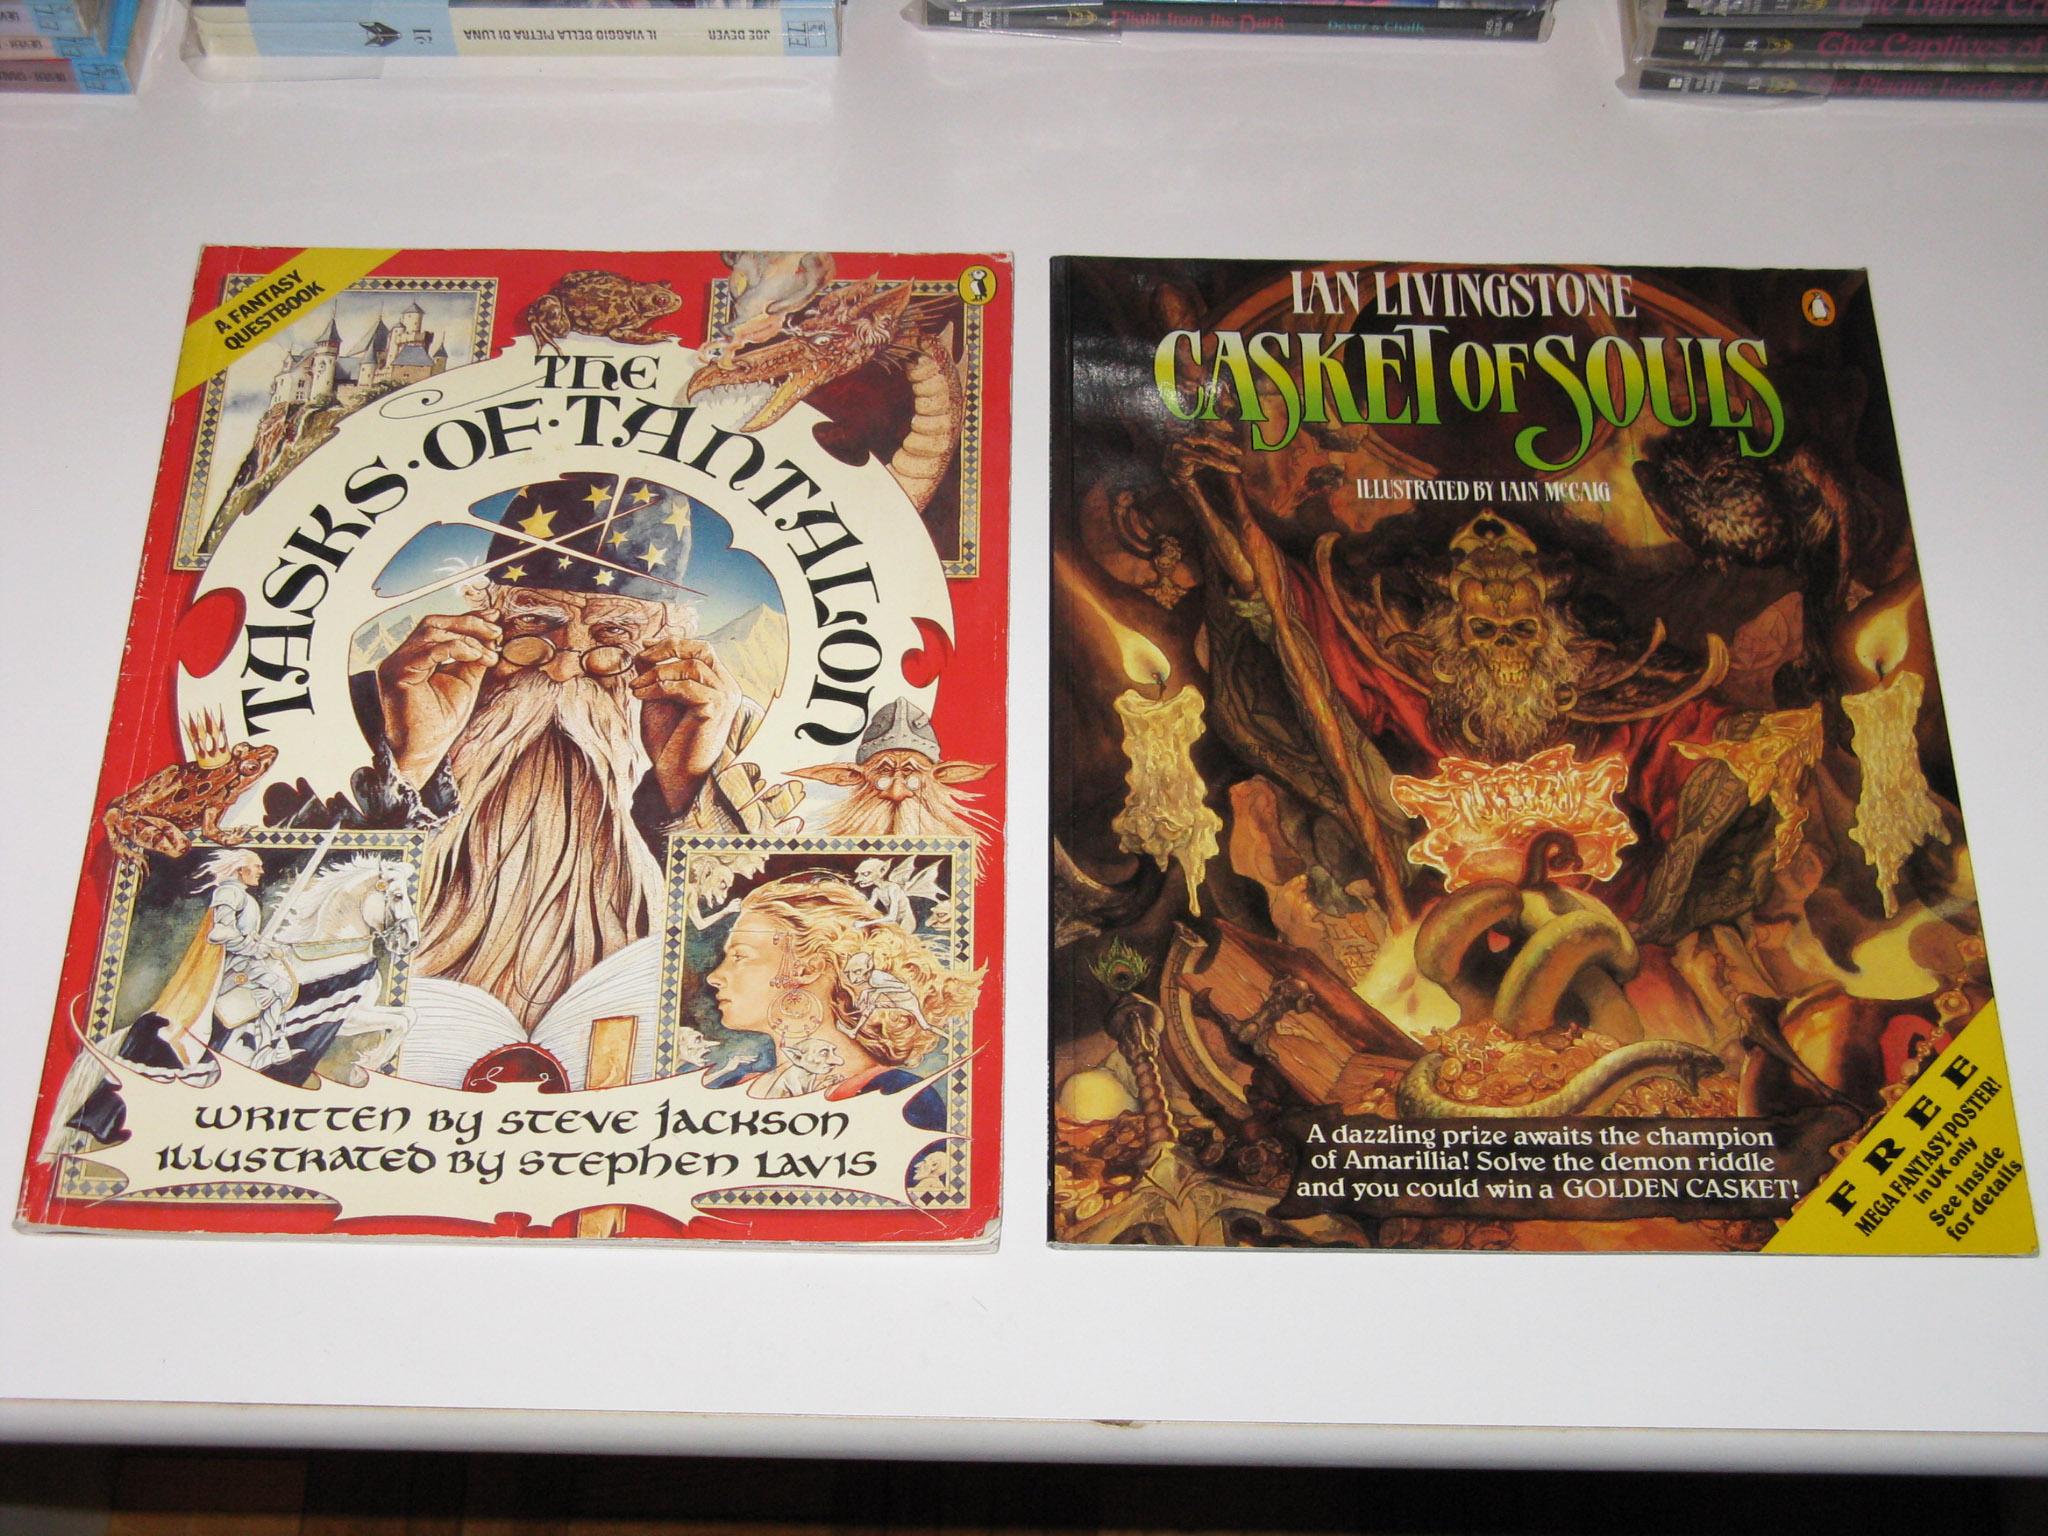 The Tasks of Tantalon + Casket of Souls